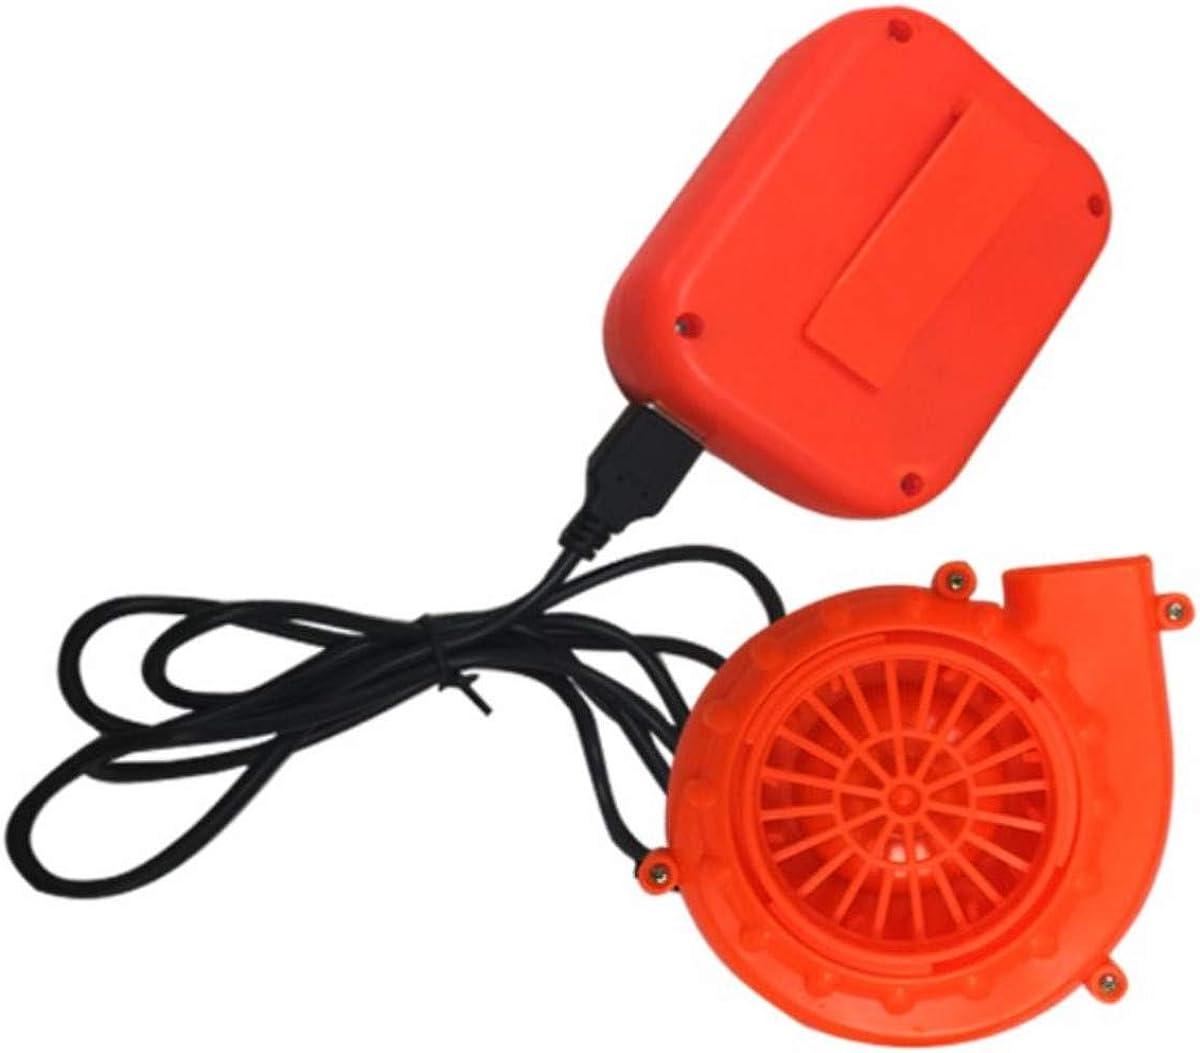 Amazon.com: ANOTHERME - Disfraz hinchable con bomba de aire ...